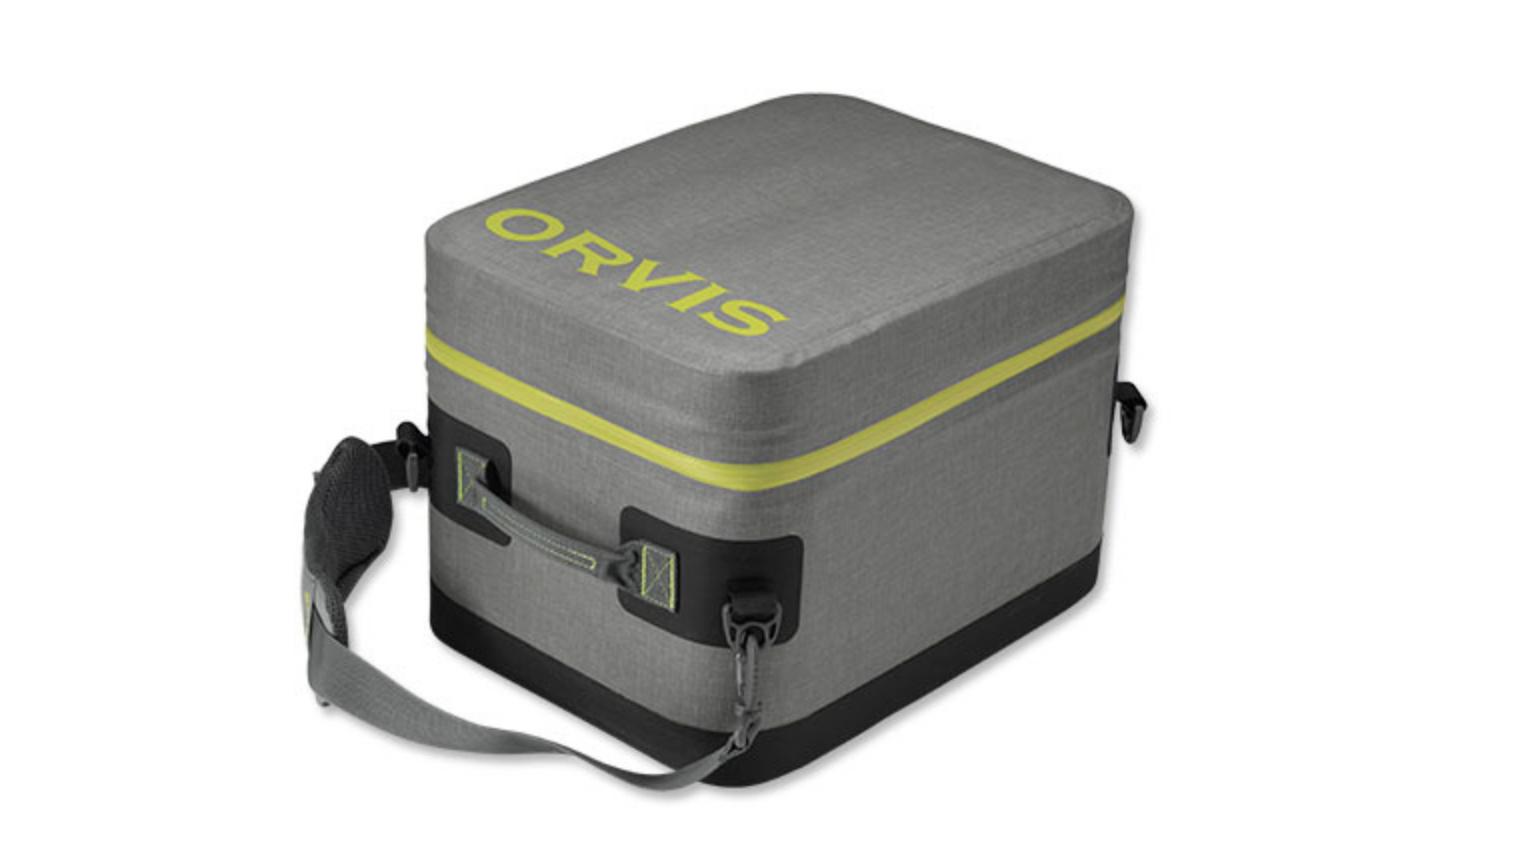 orvis boat bag